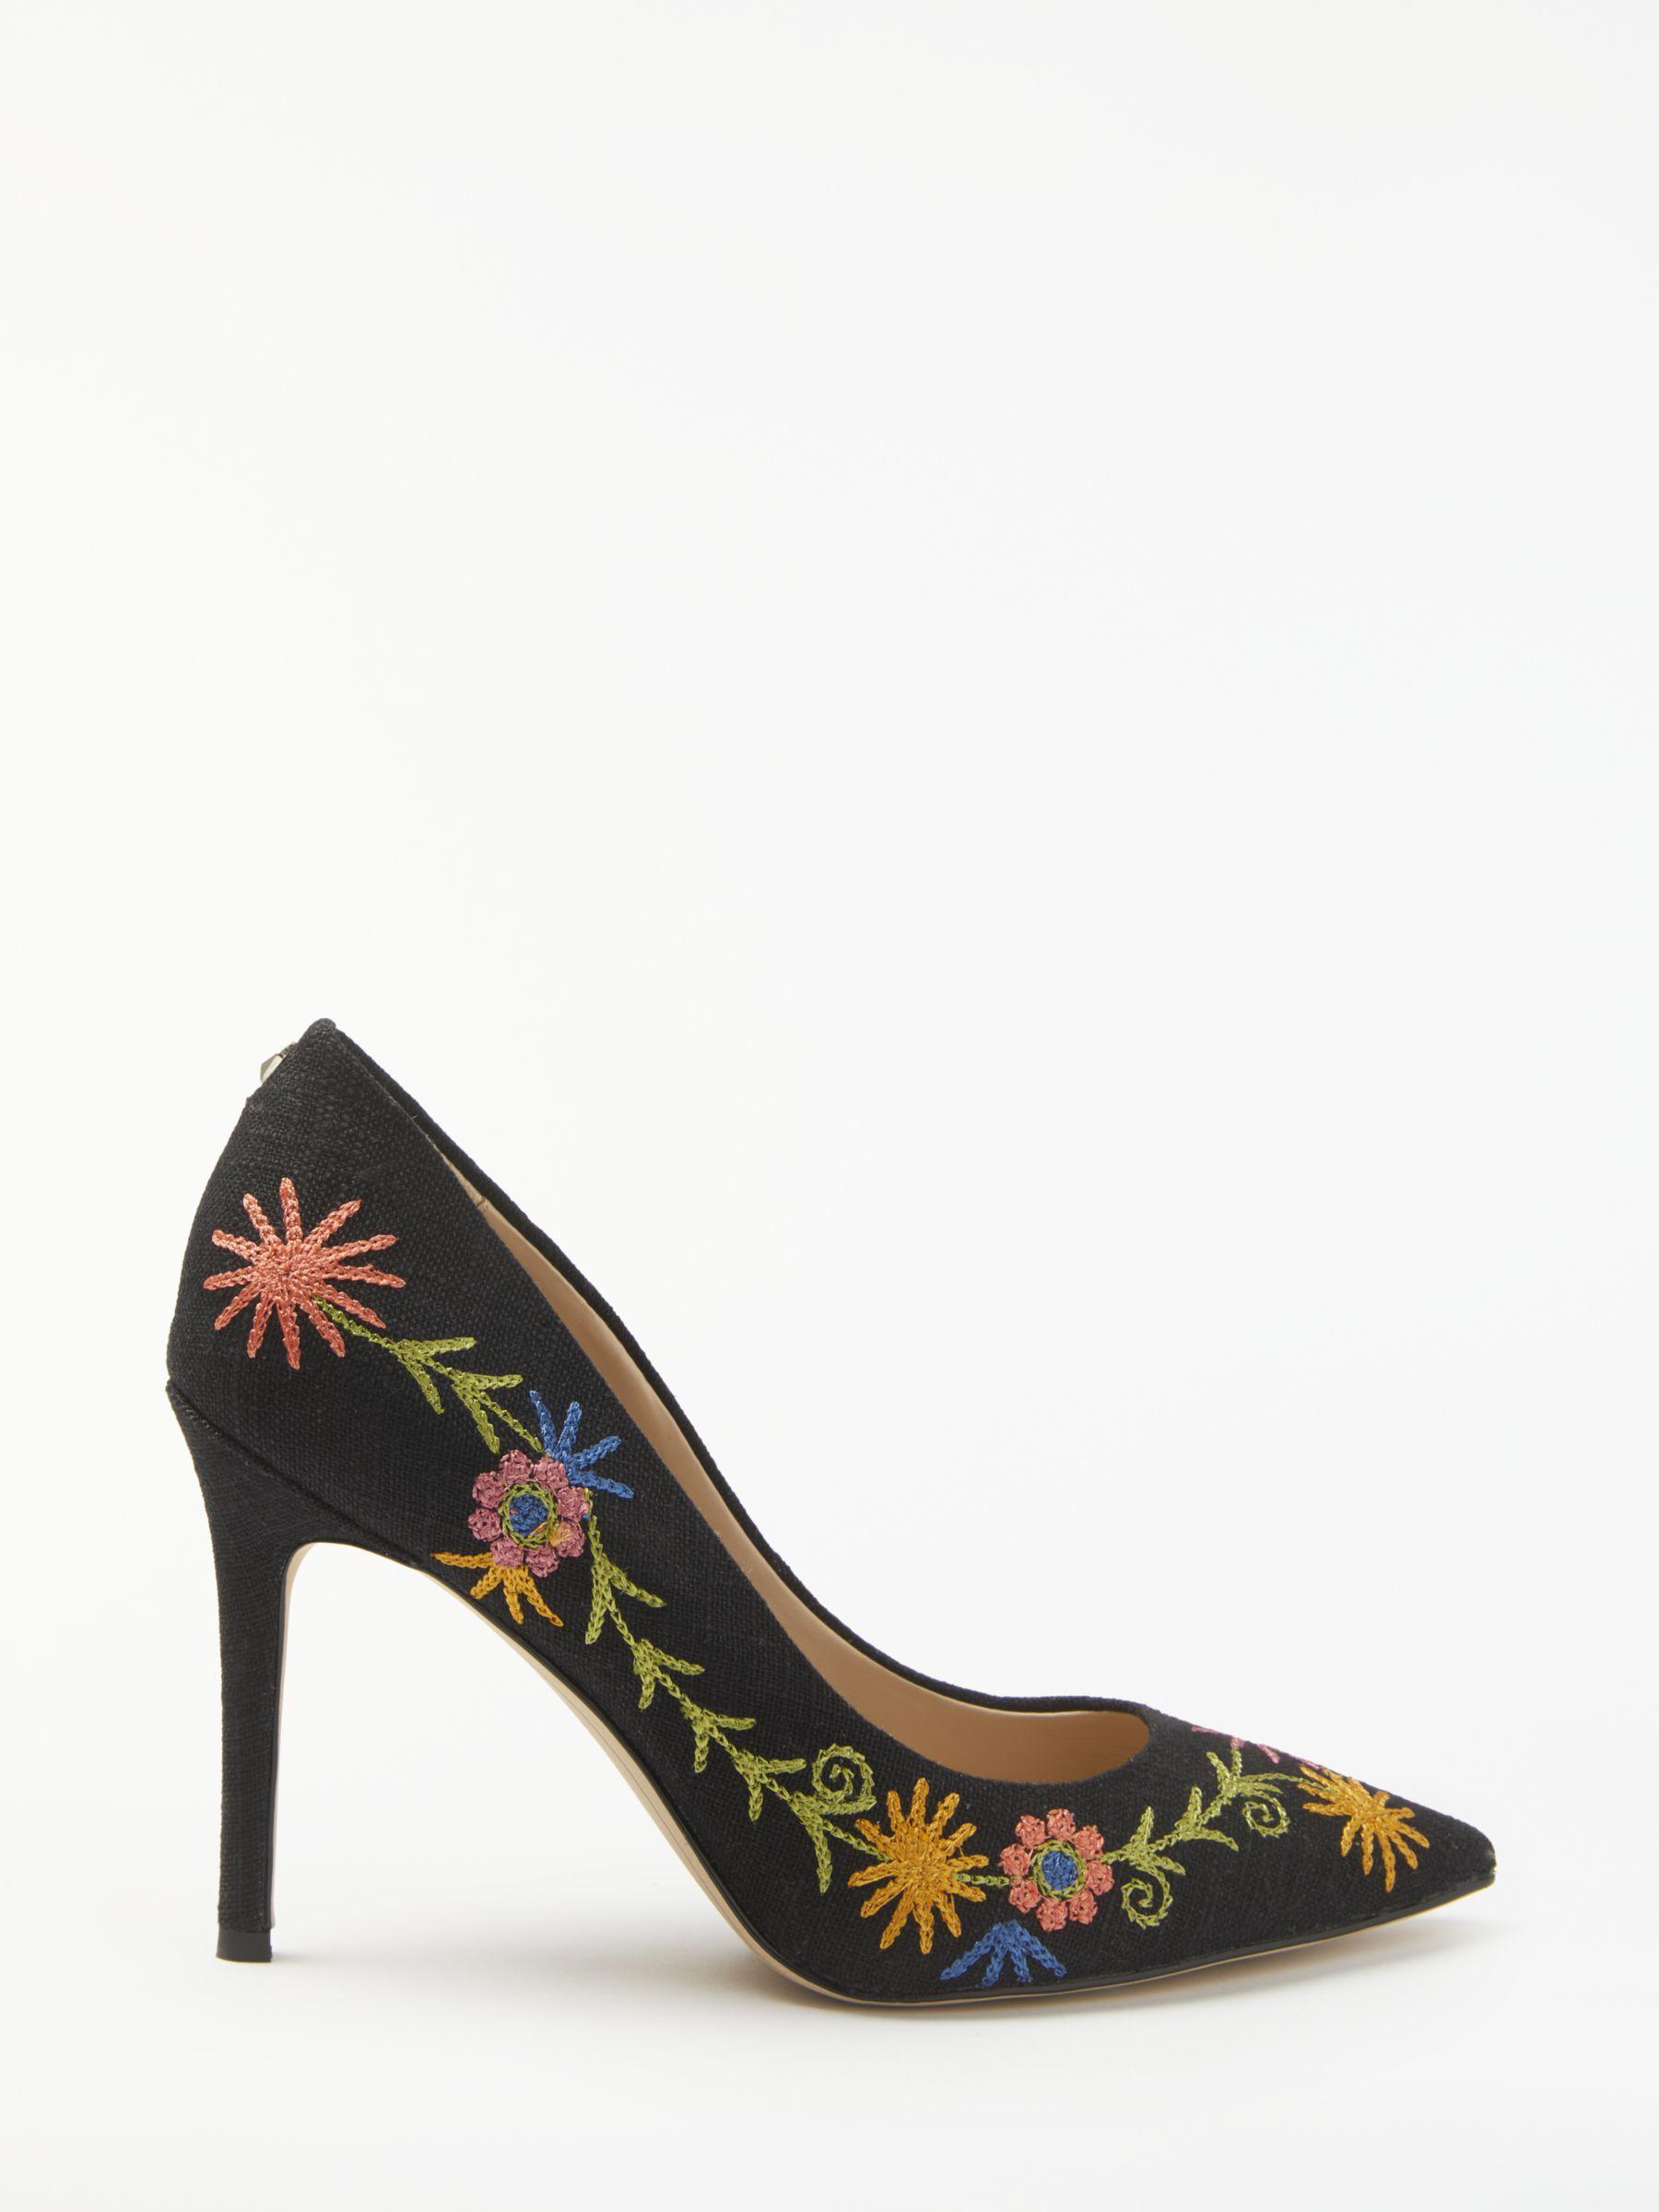 eb62b6dd4c769e Sam Edelman Hazel Pointed Toe Stiletto Court Shoes